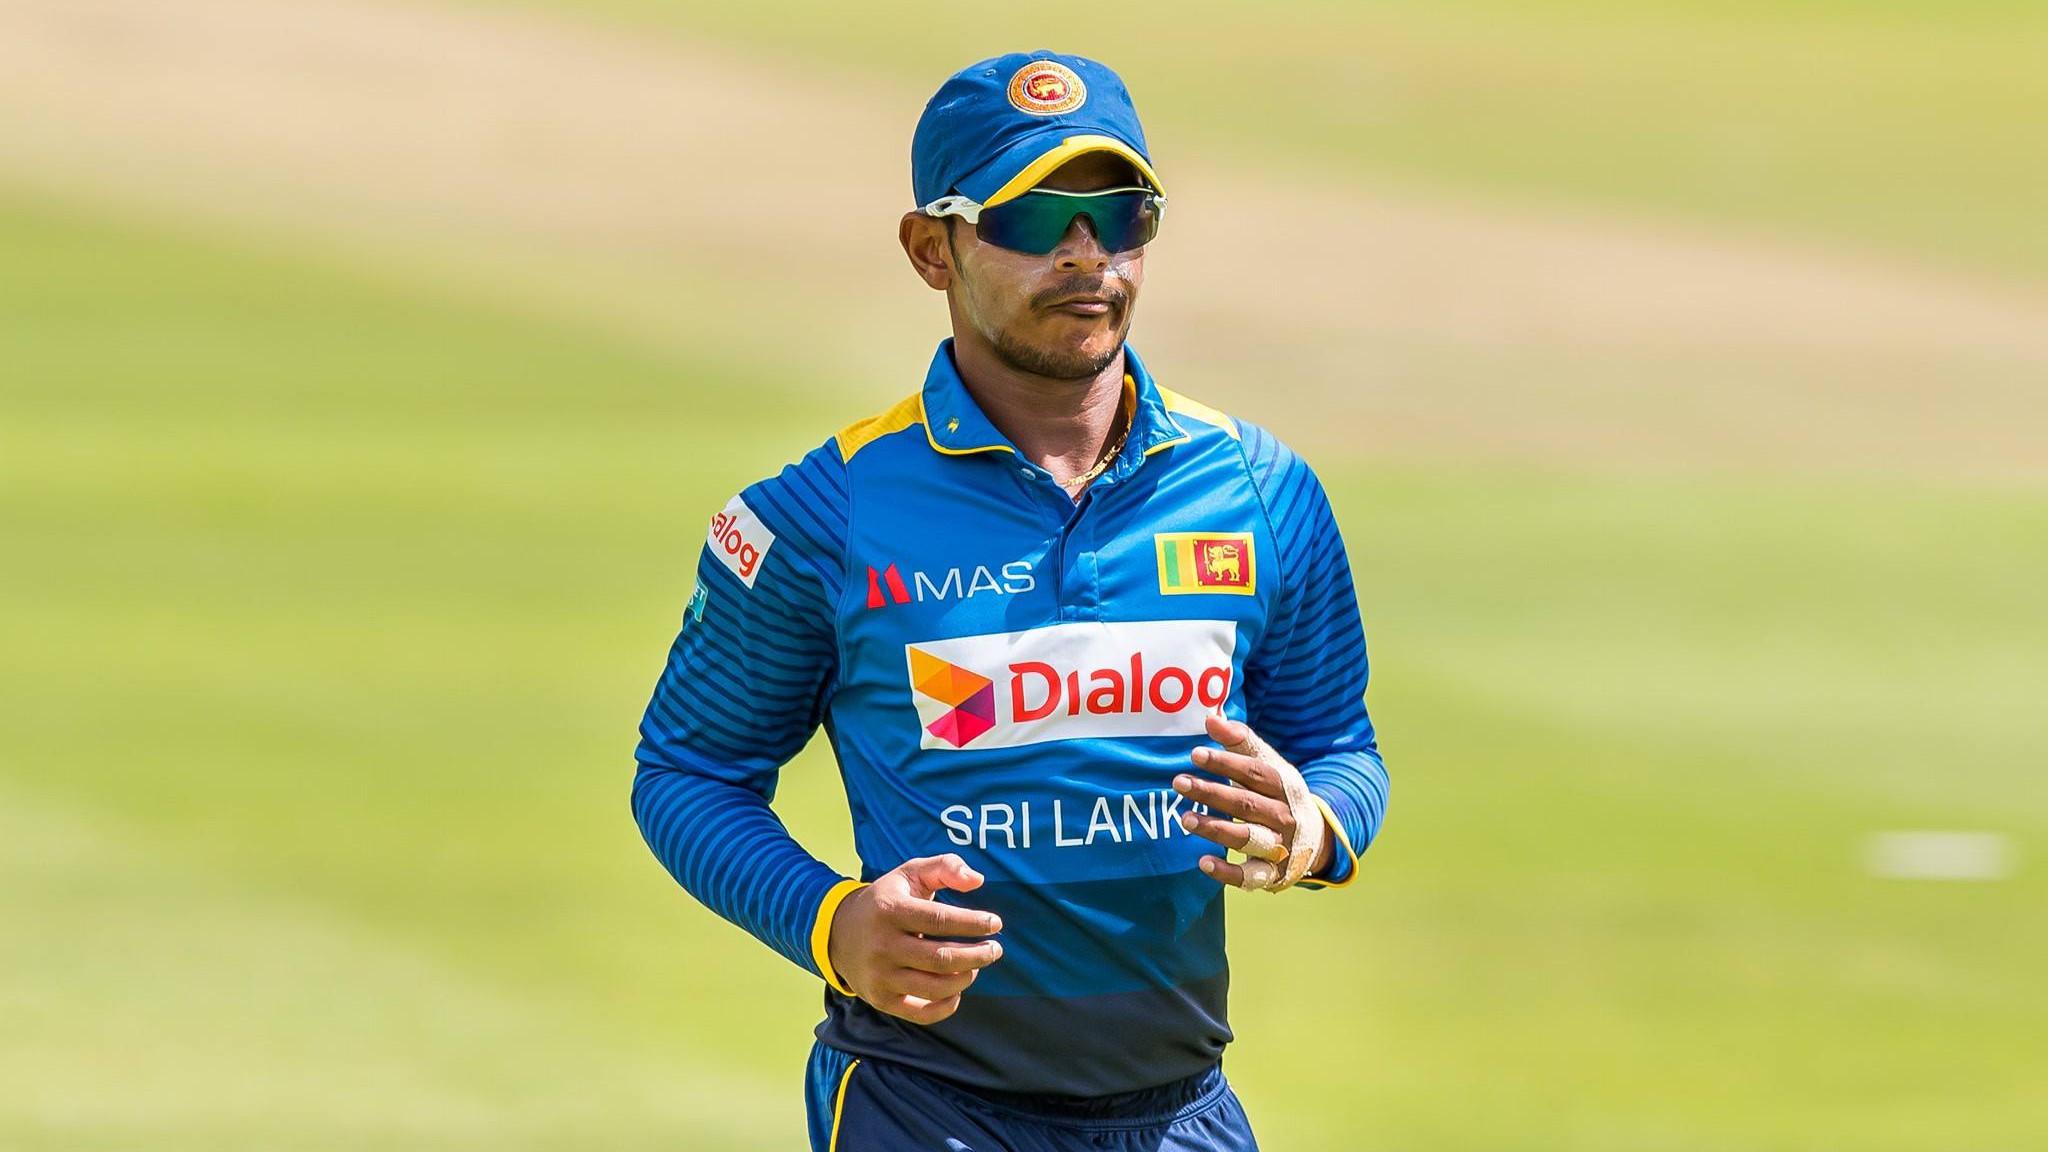 SL v IND 2021: Sri Lanka cricketer Sandun Weerakkody tests COVID-19 positive